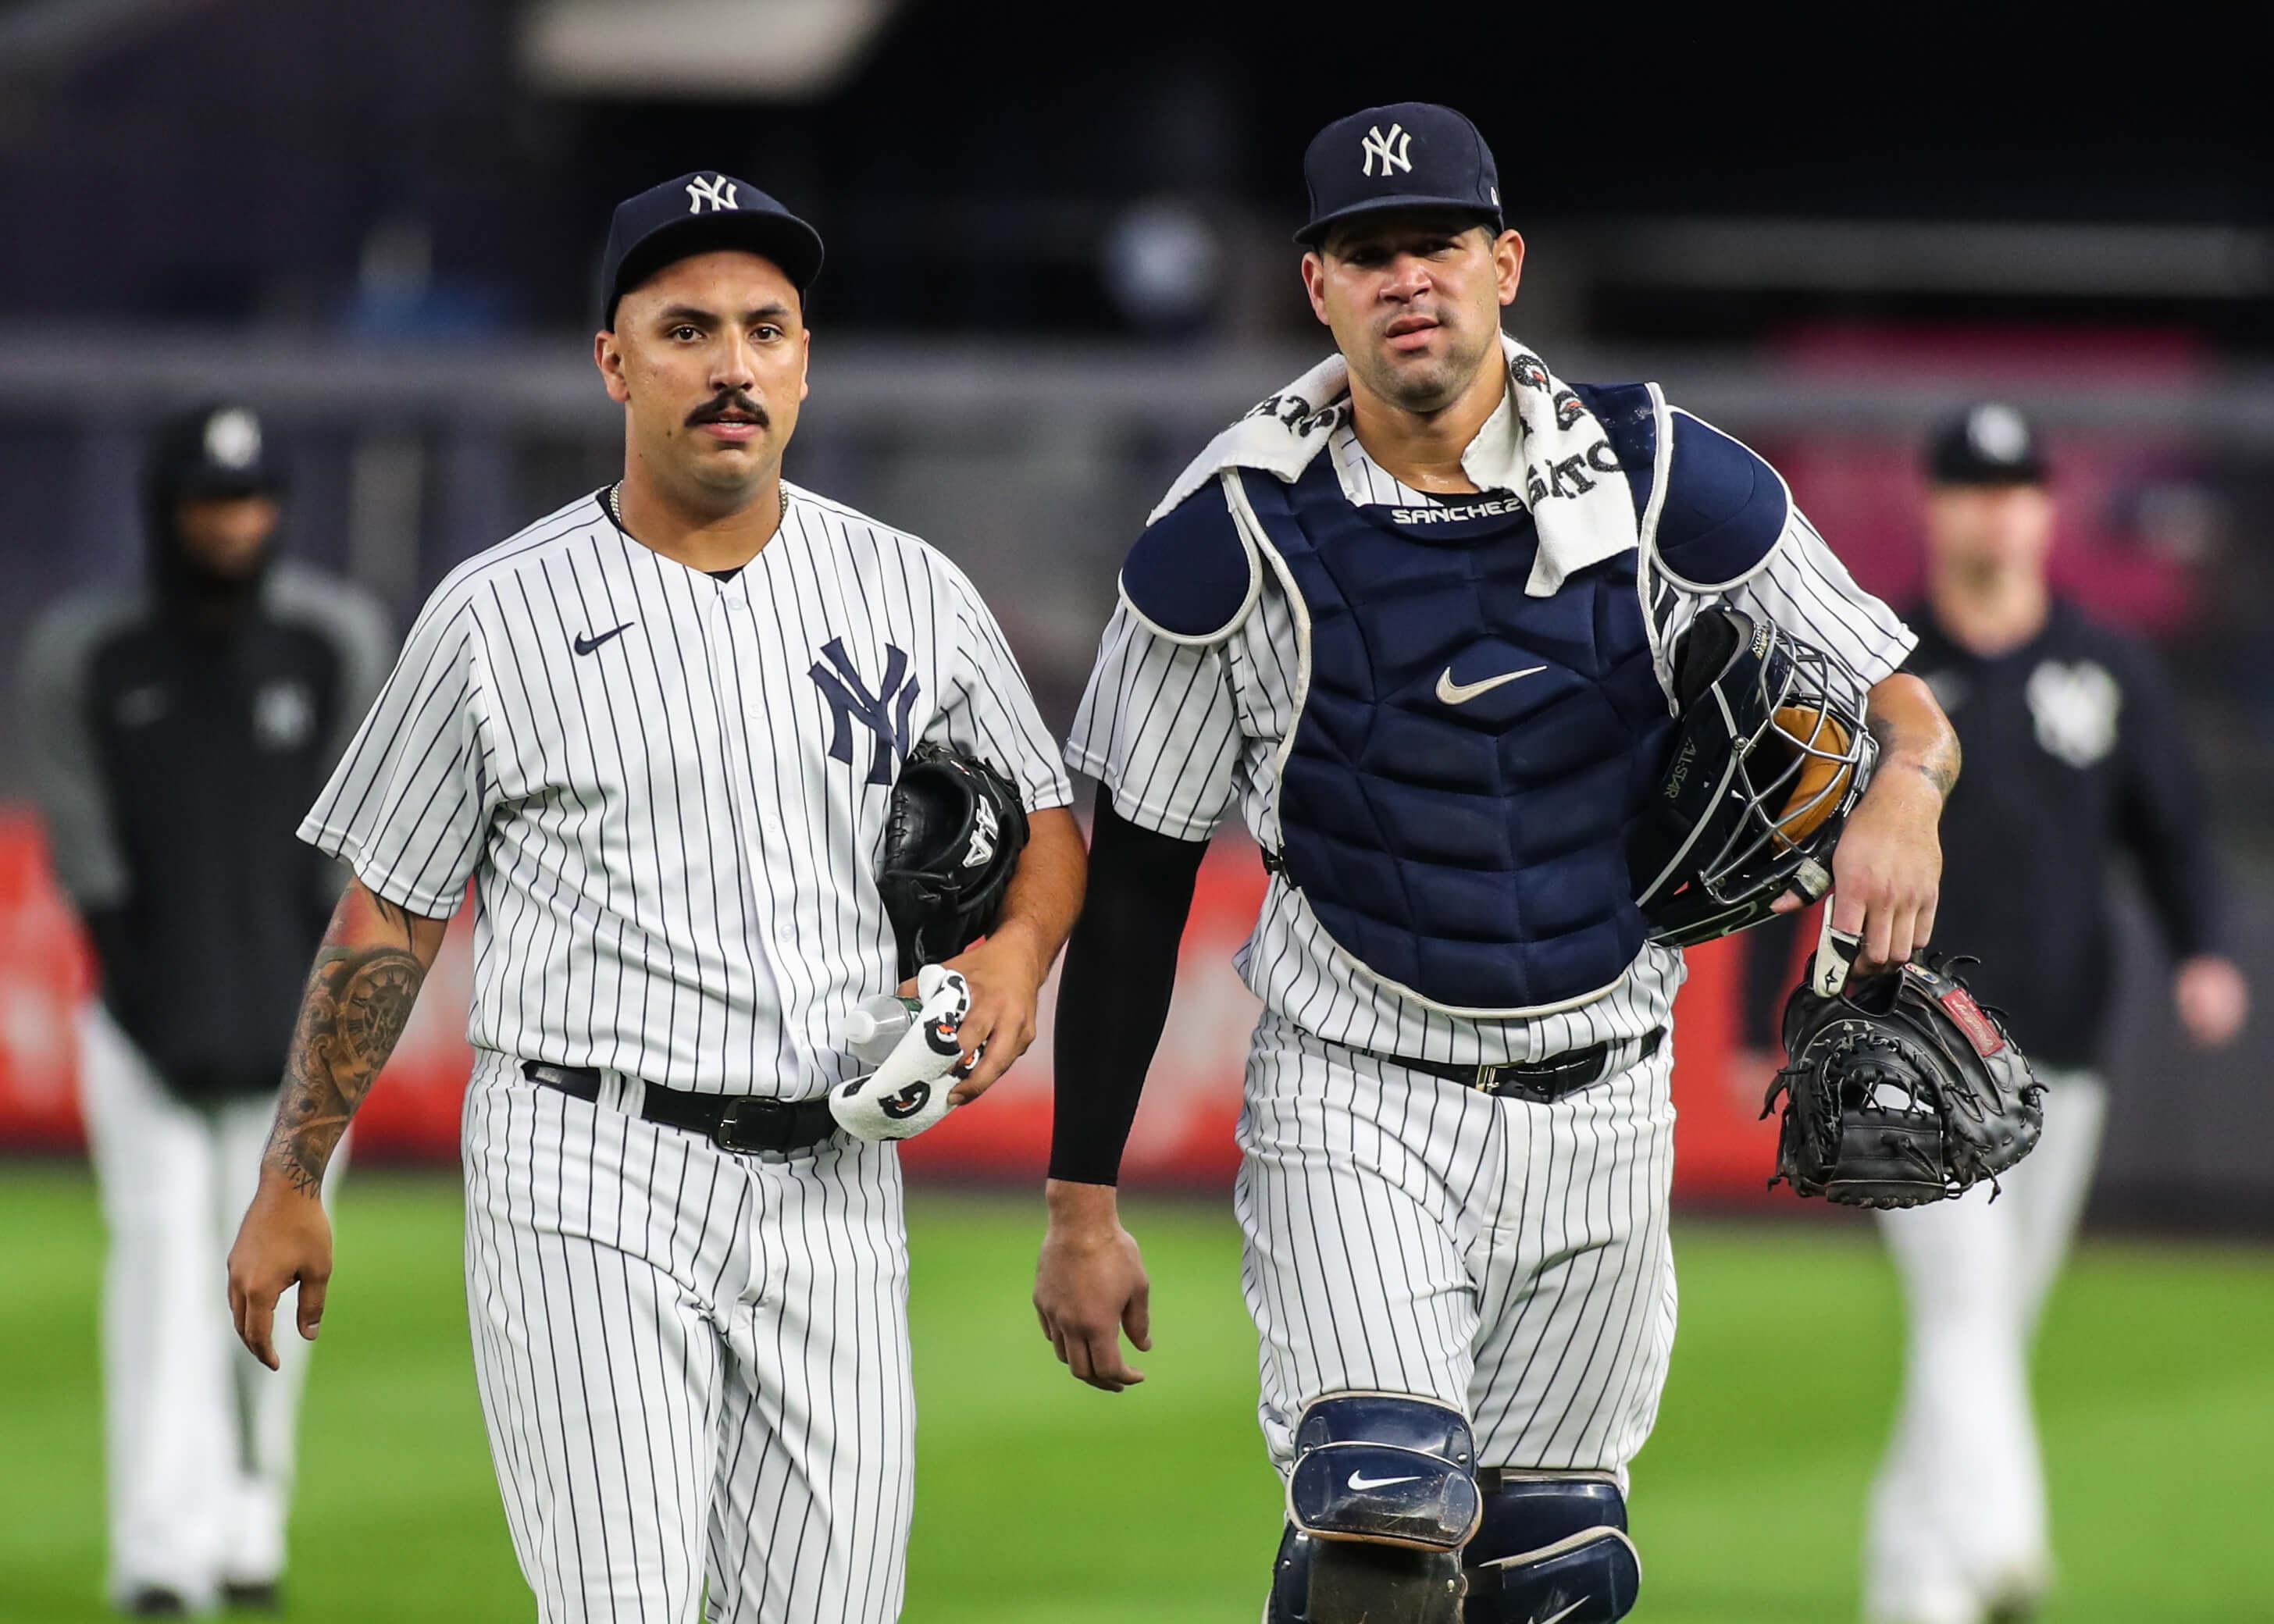 New York Yankees, Nestor Cortes Jr.